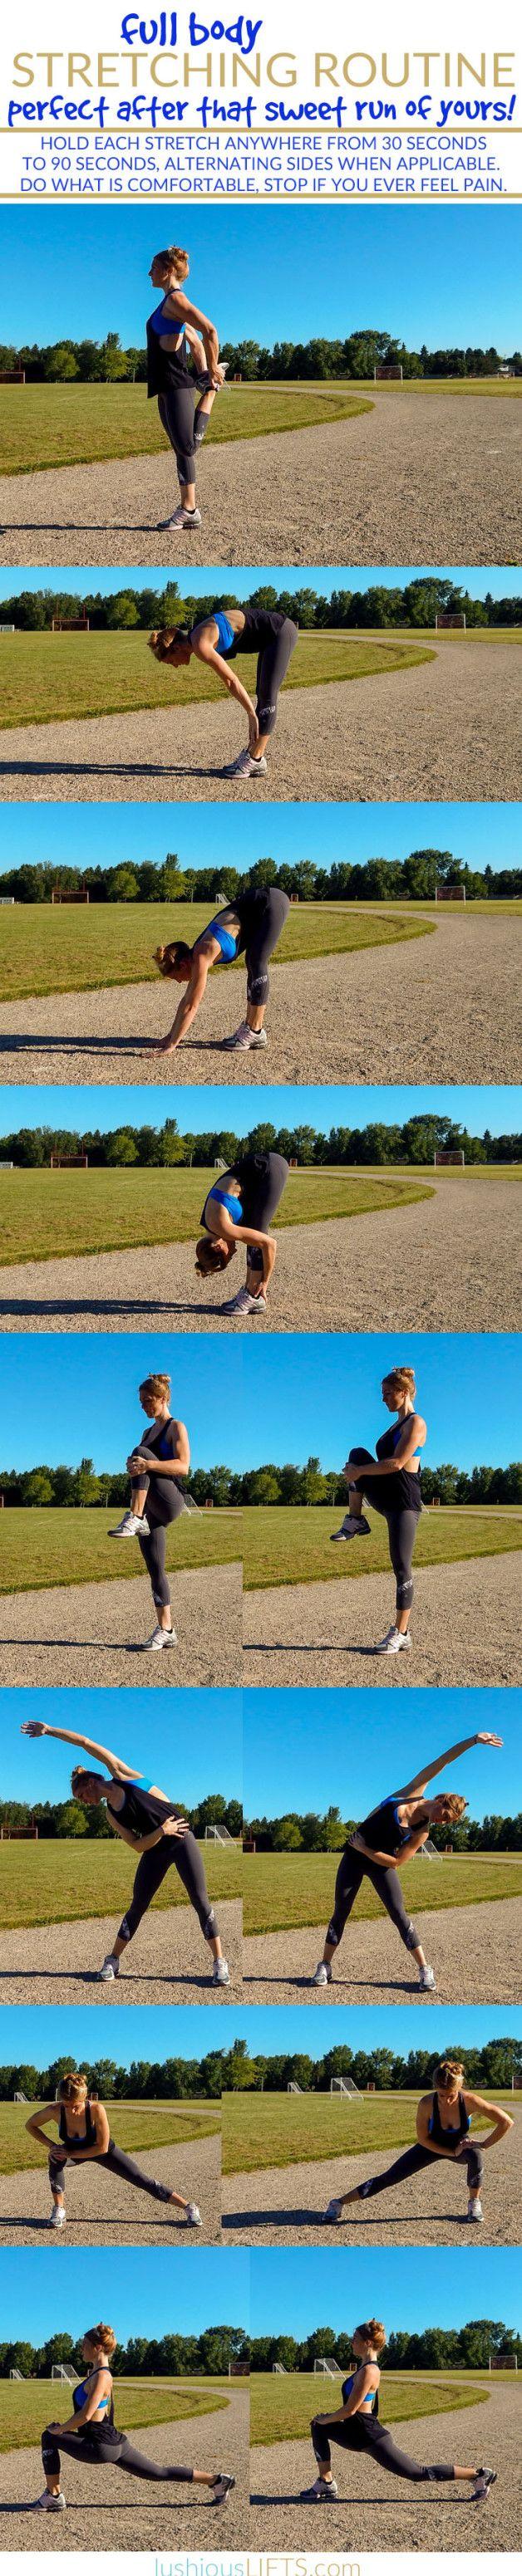 Post Run Full Body Stretching Routine || lushiousLIFTS.com